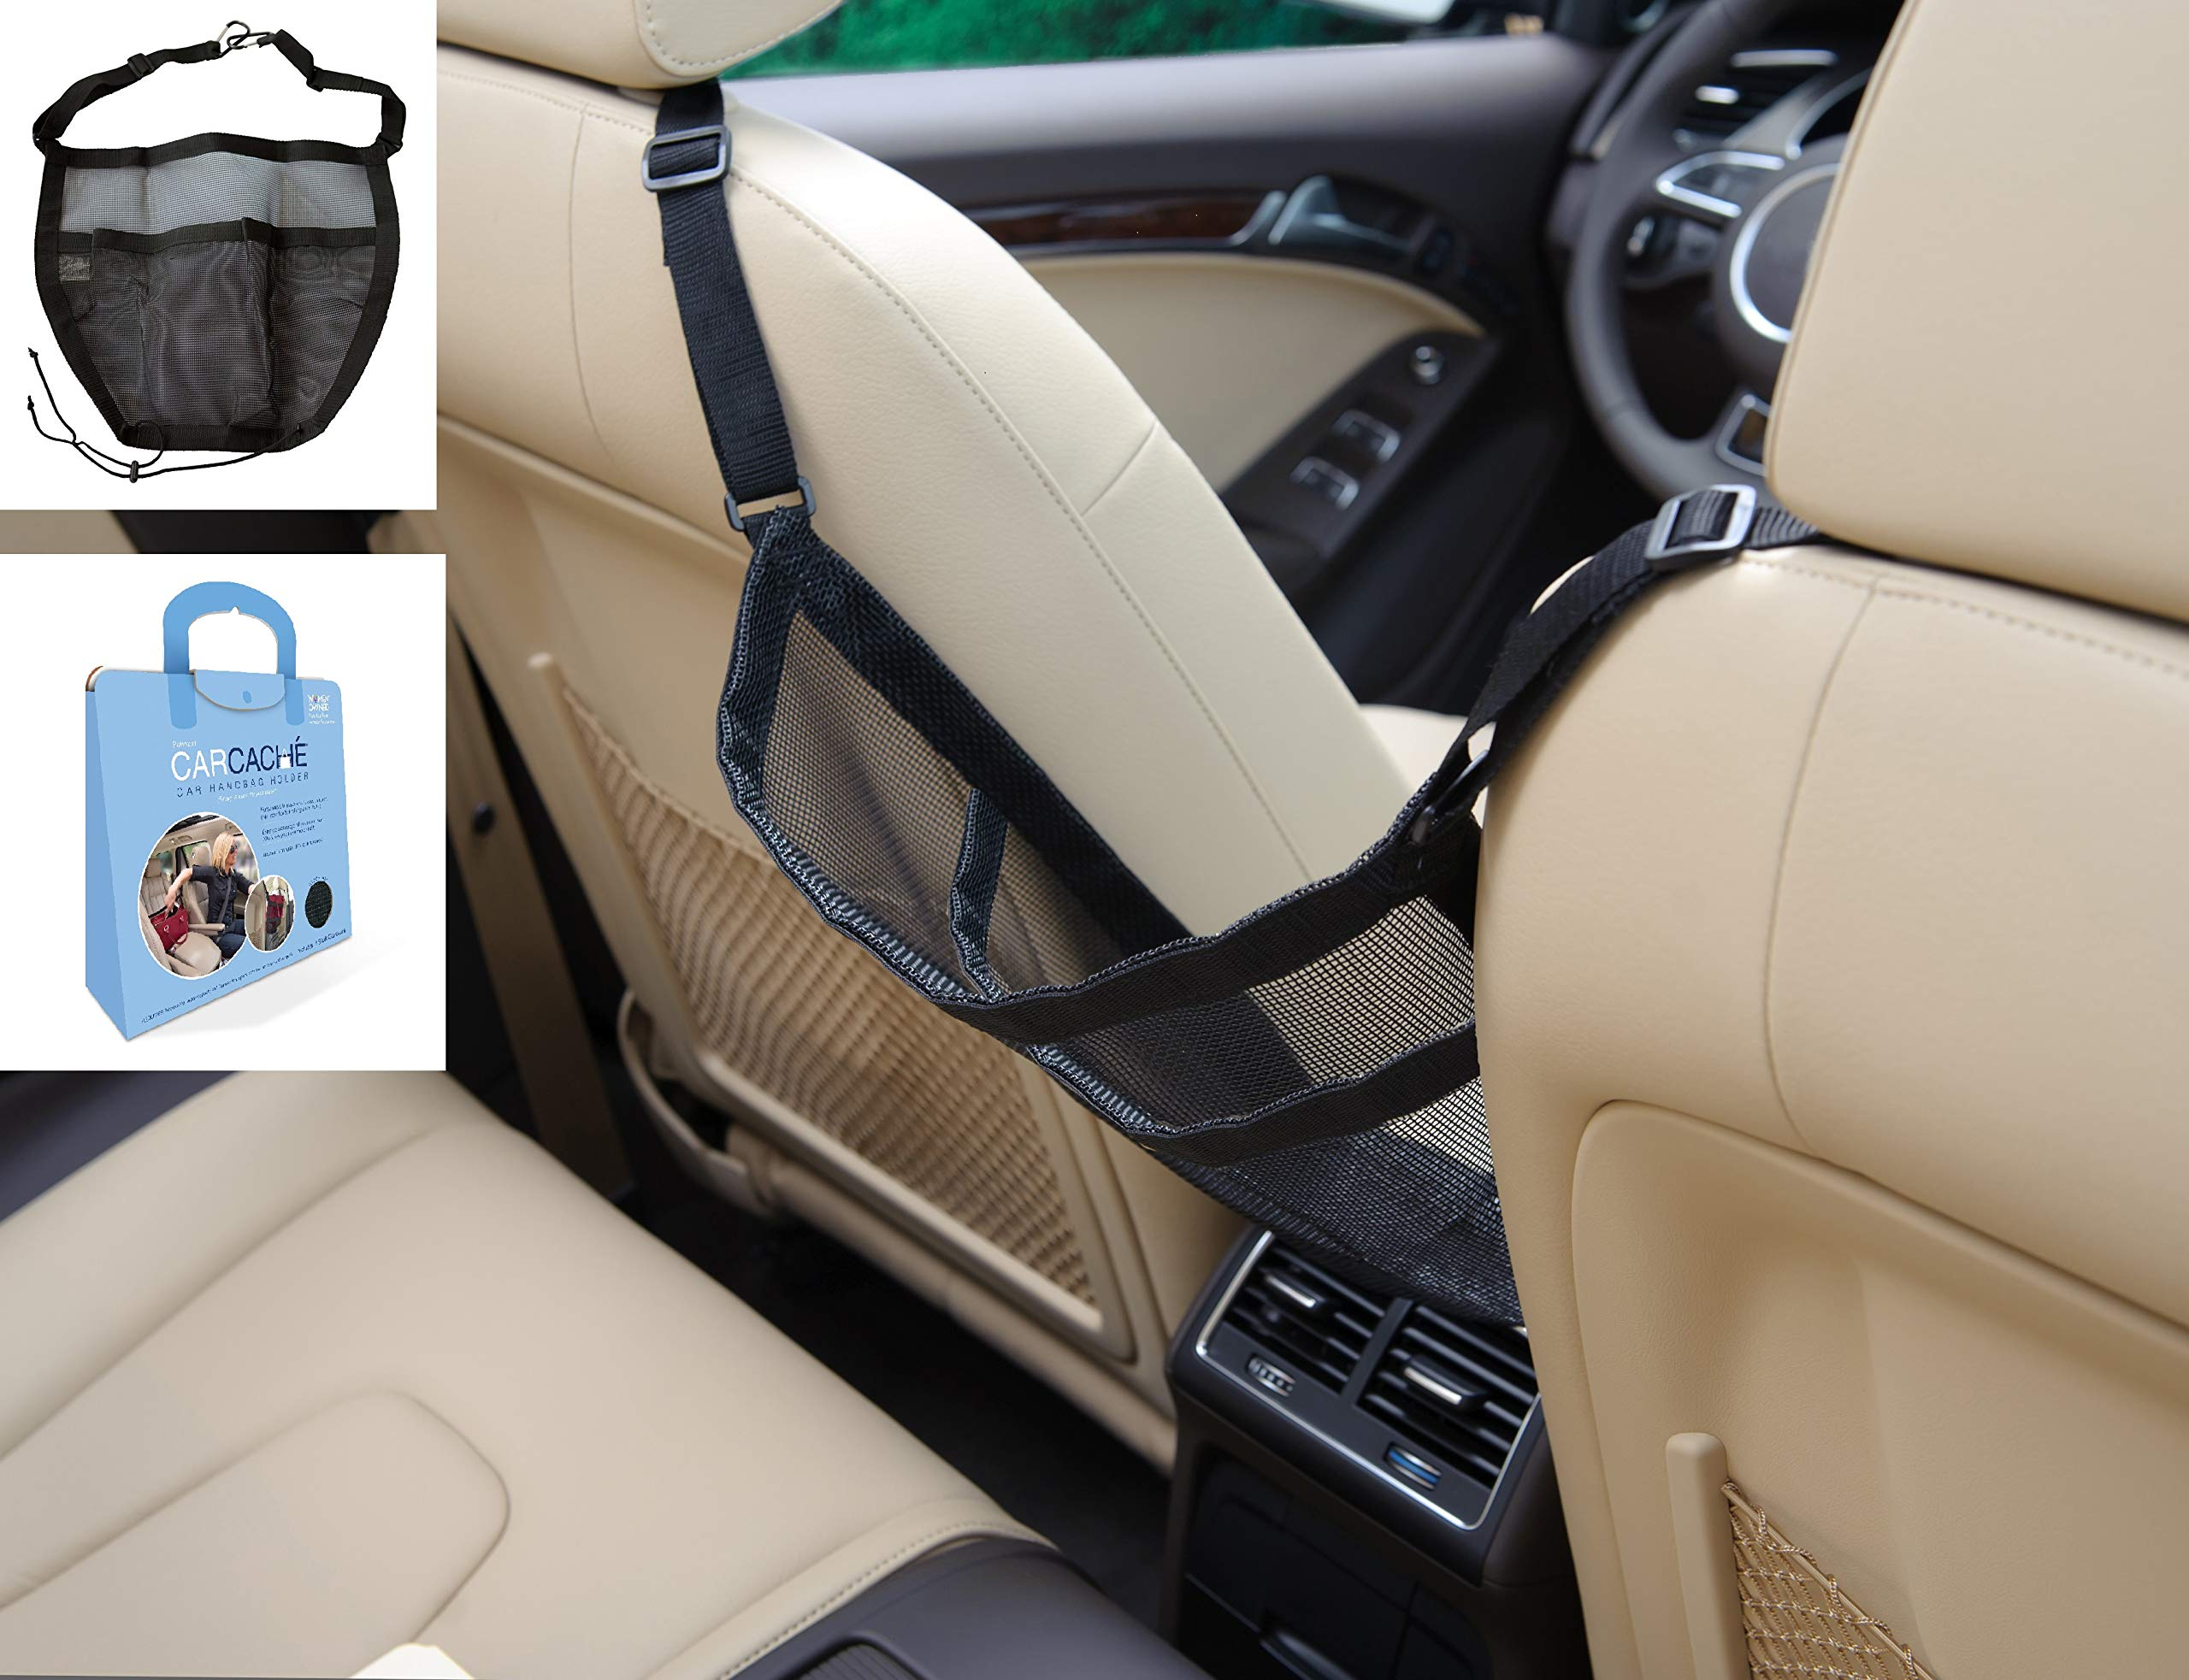 Car Cache - Handbag Holder: Storage for Purse & Pocket for Smaller Items - Helps as Dog Barrier, Too! Original Invention, Patented